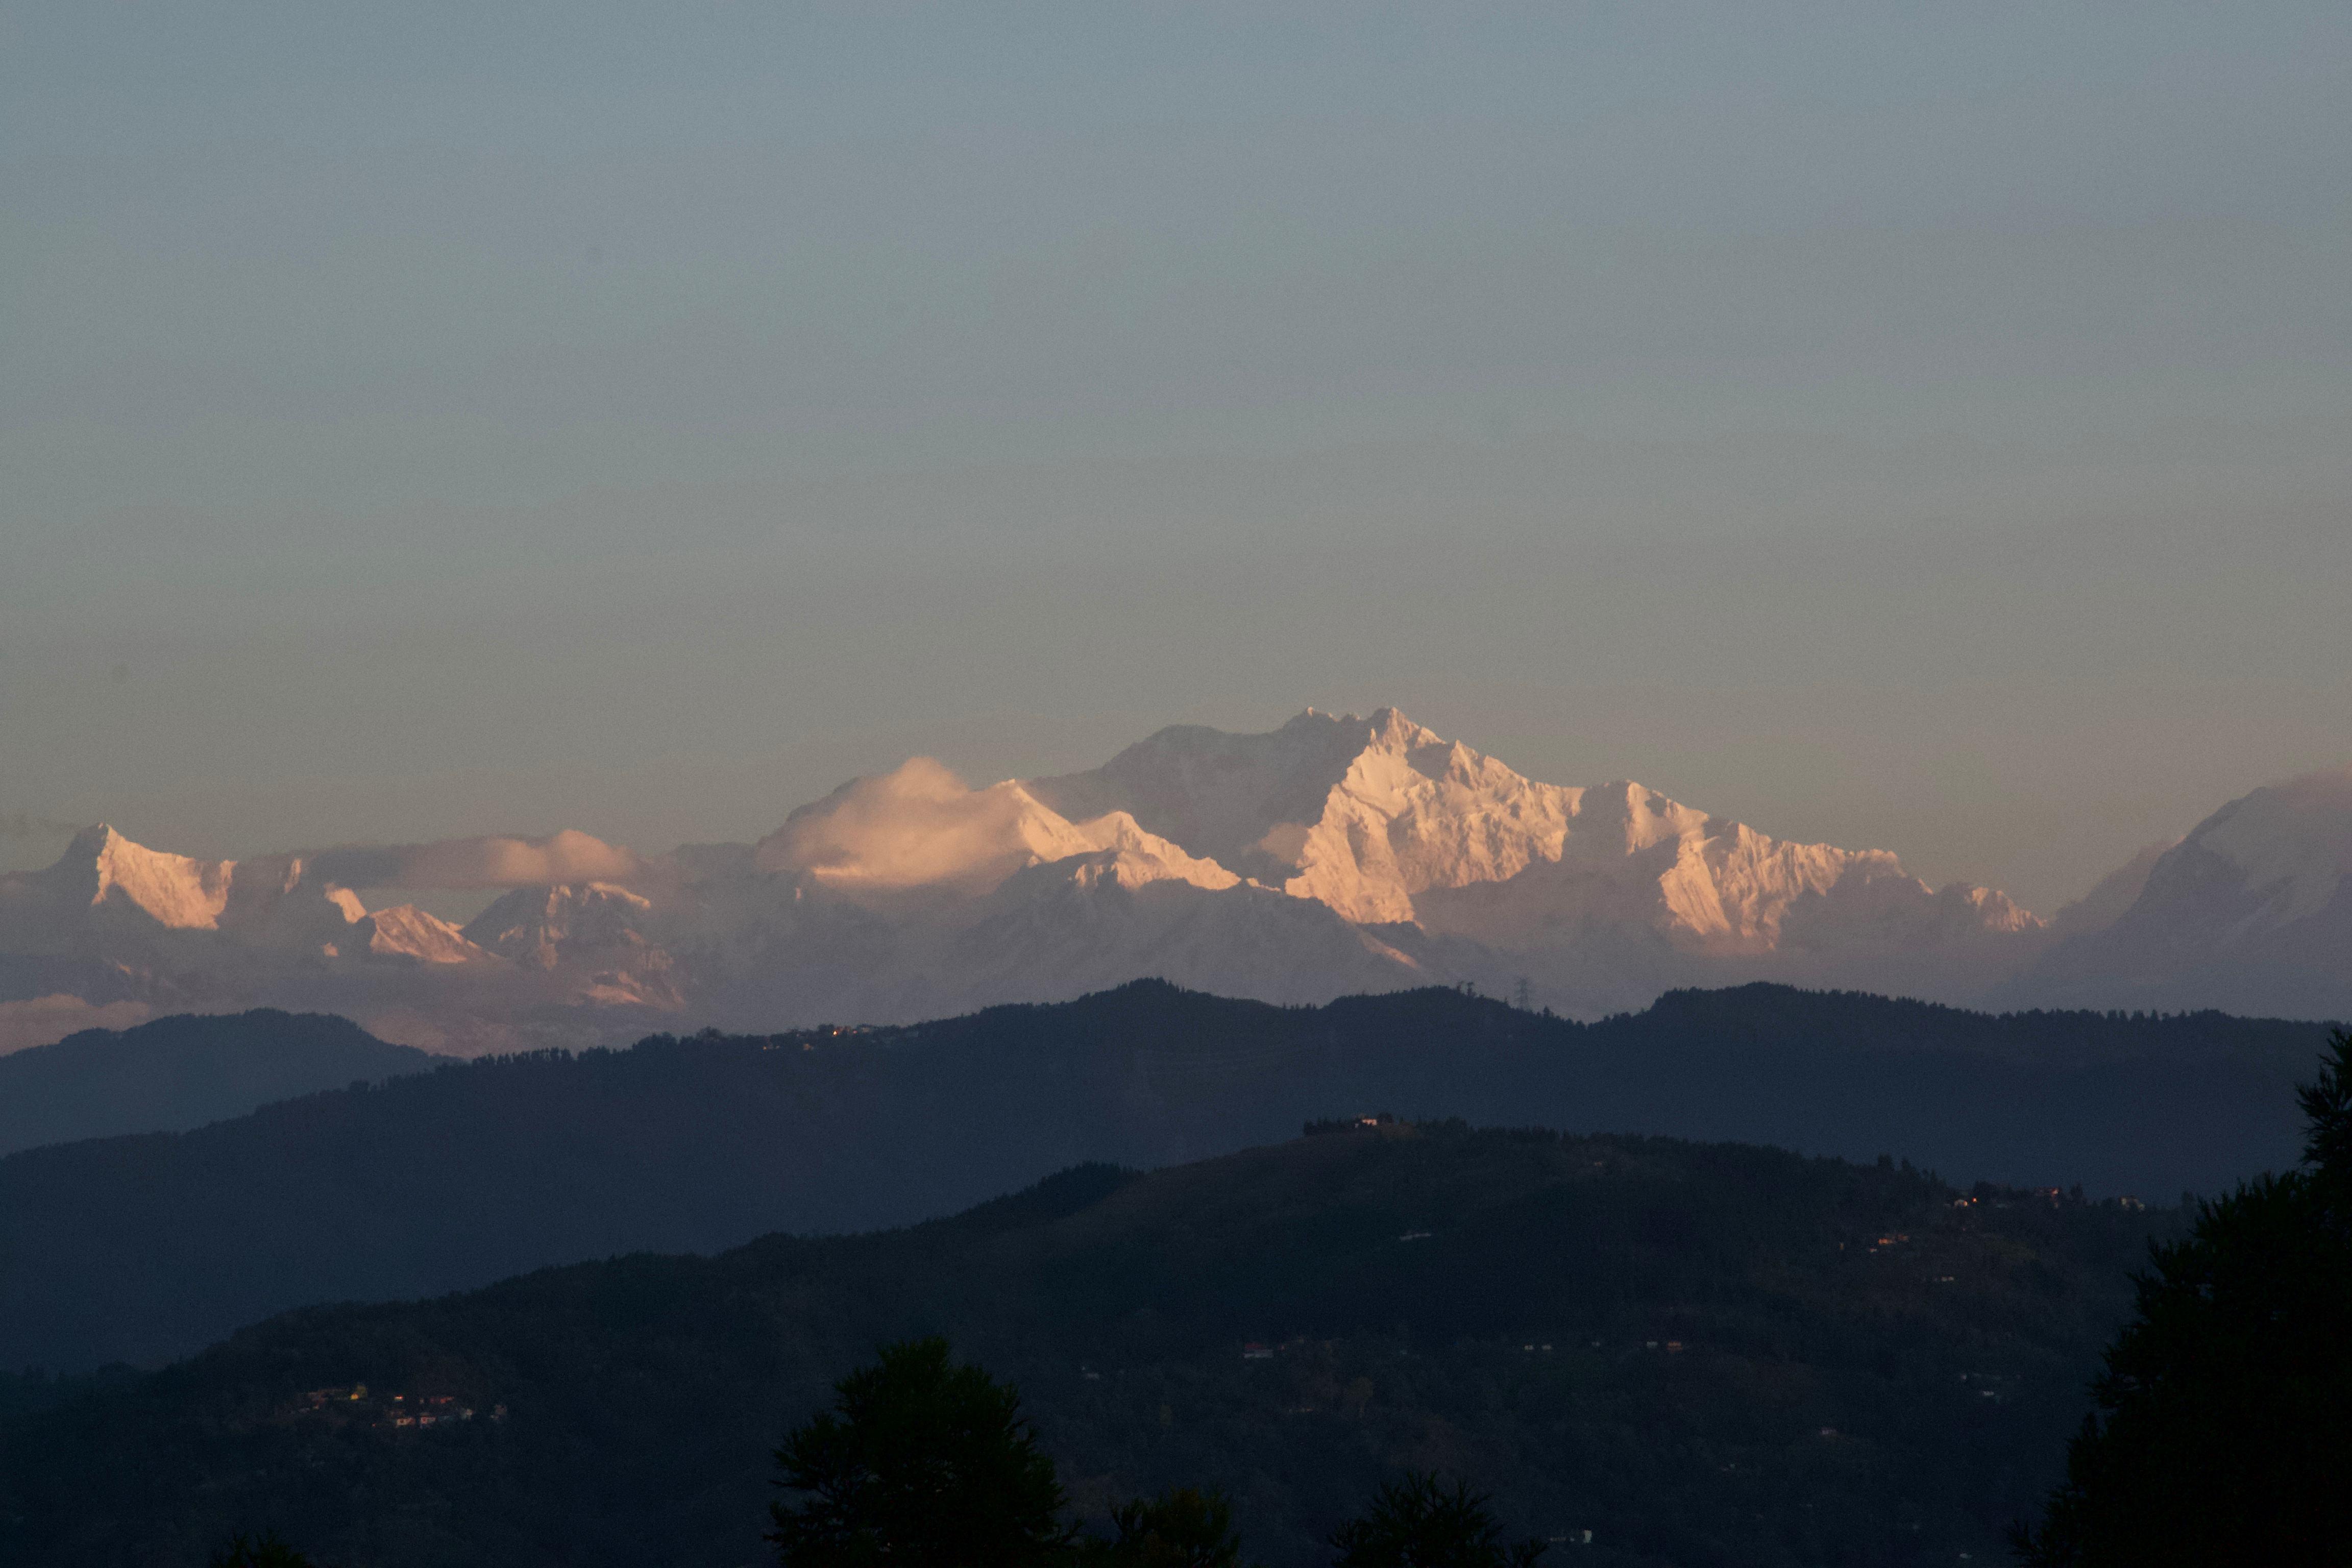 Shree Antu - Kanchenjunga - Sunrise view